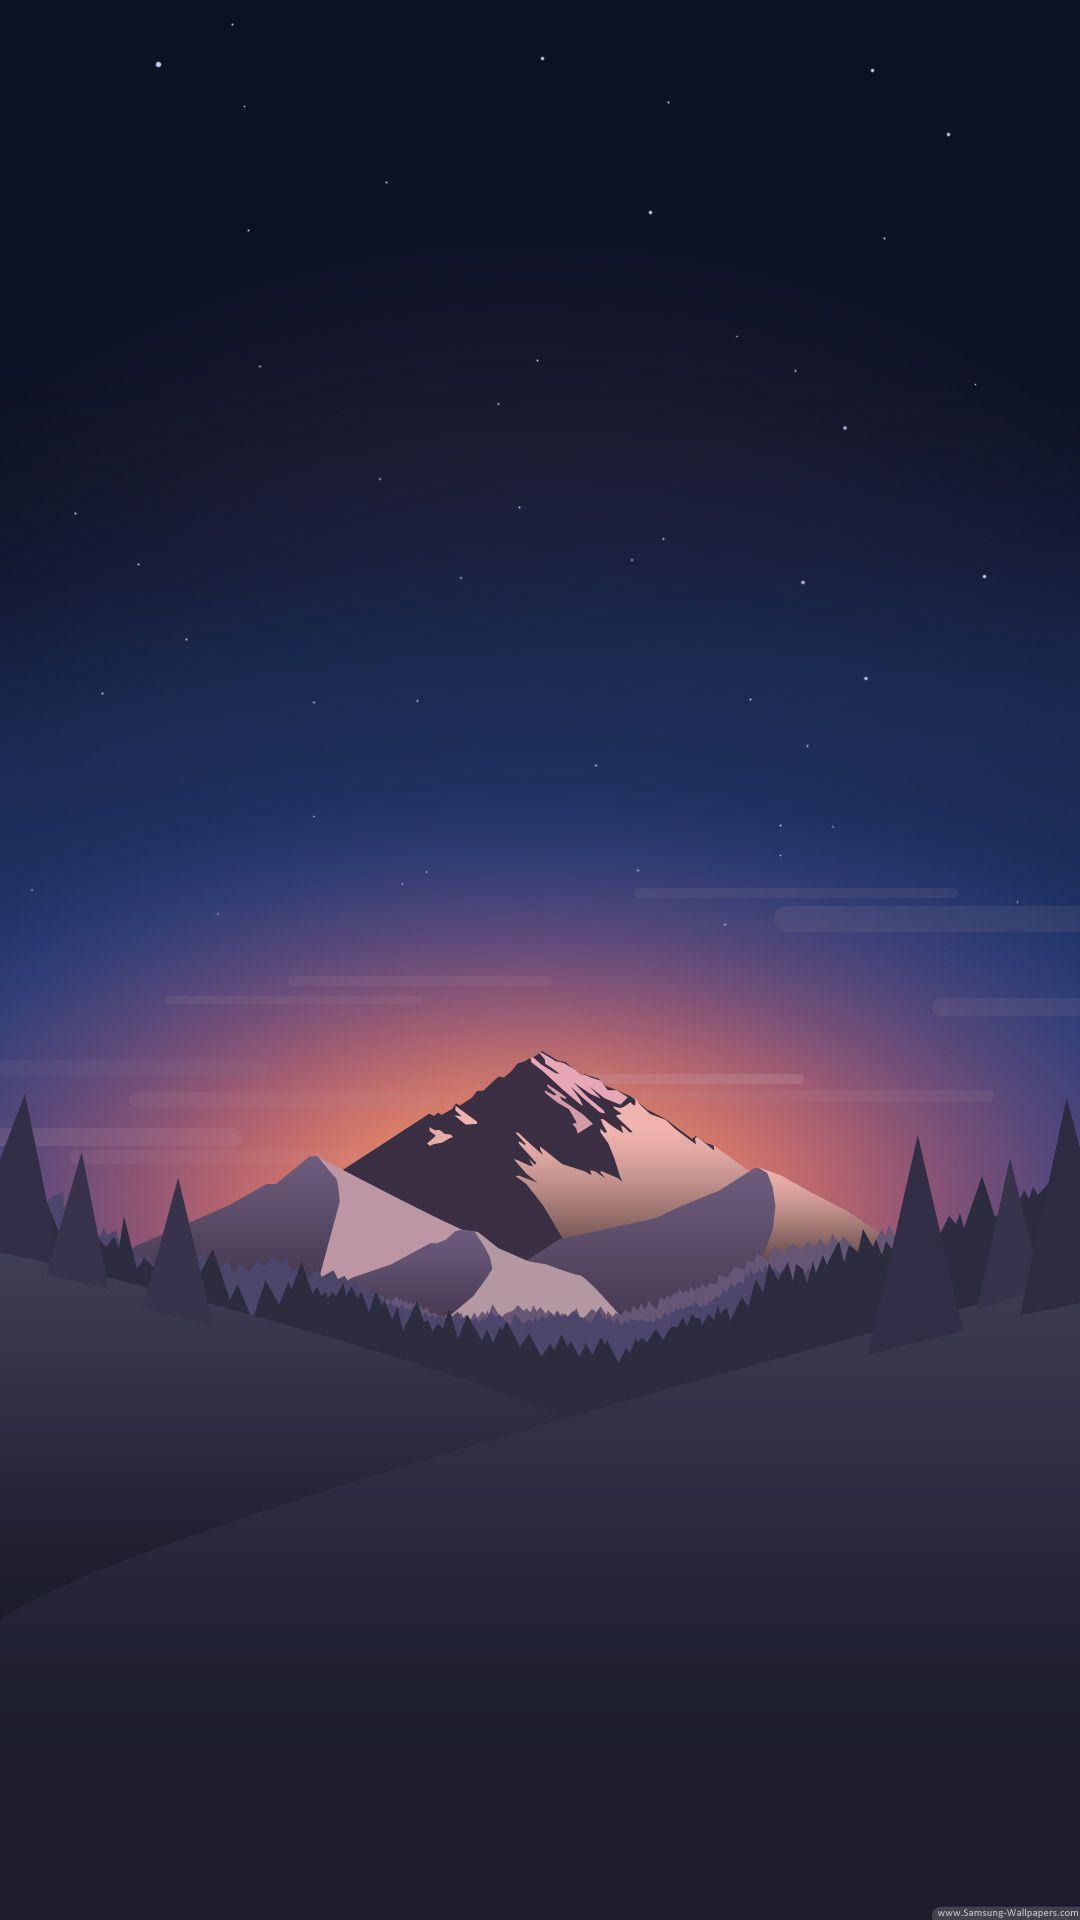 Mystic Mountain. Landscape wallpaper, Minimal wallpaper